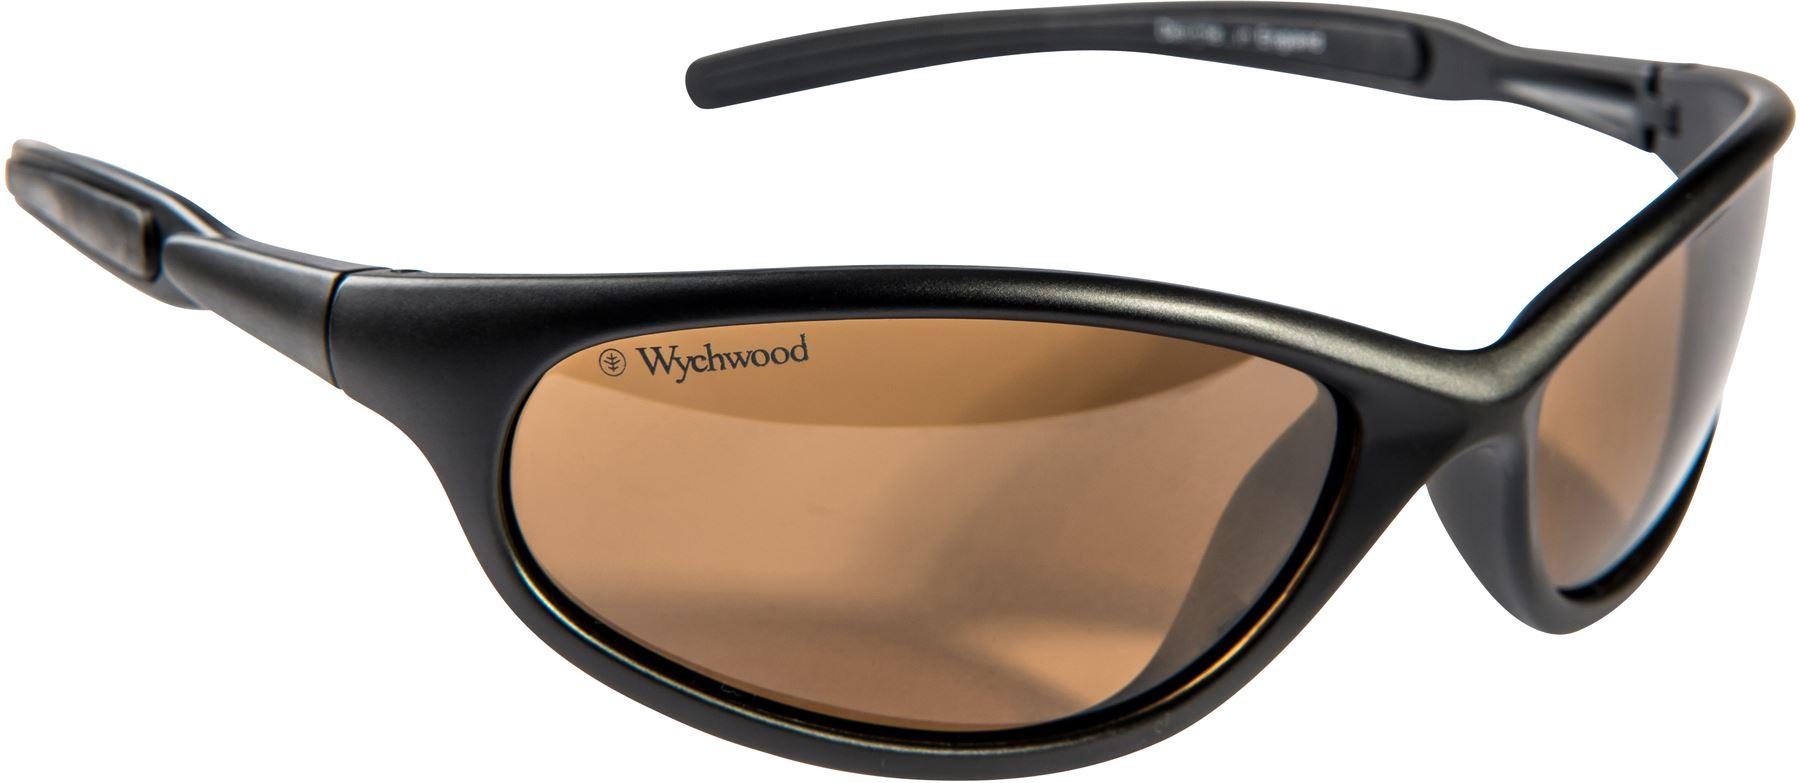 2db82e03b2f Wychwood Tips Brown Lens Sunglasses   Fishing for sale online